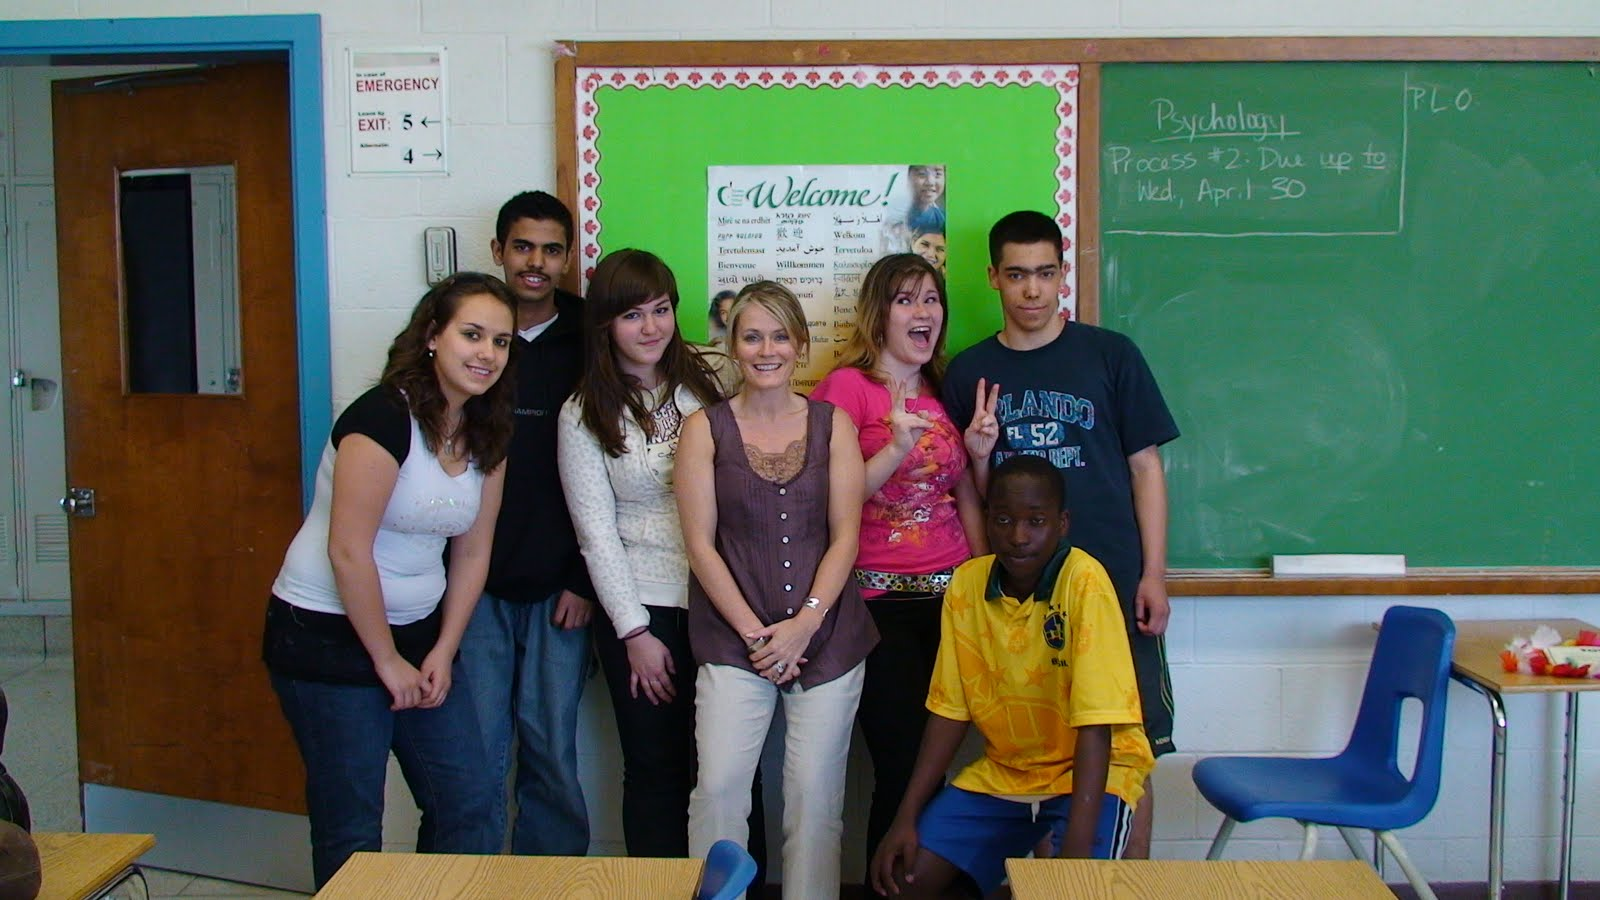 Esl For High School Students